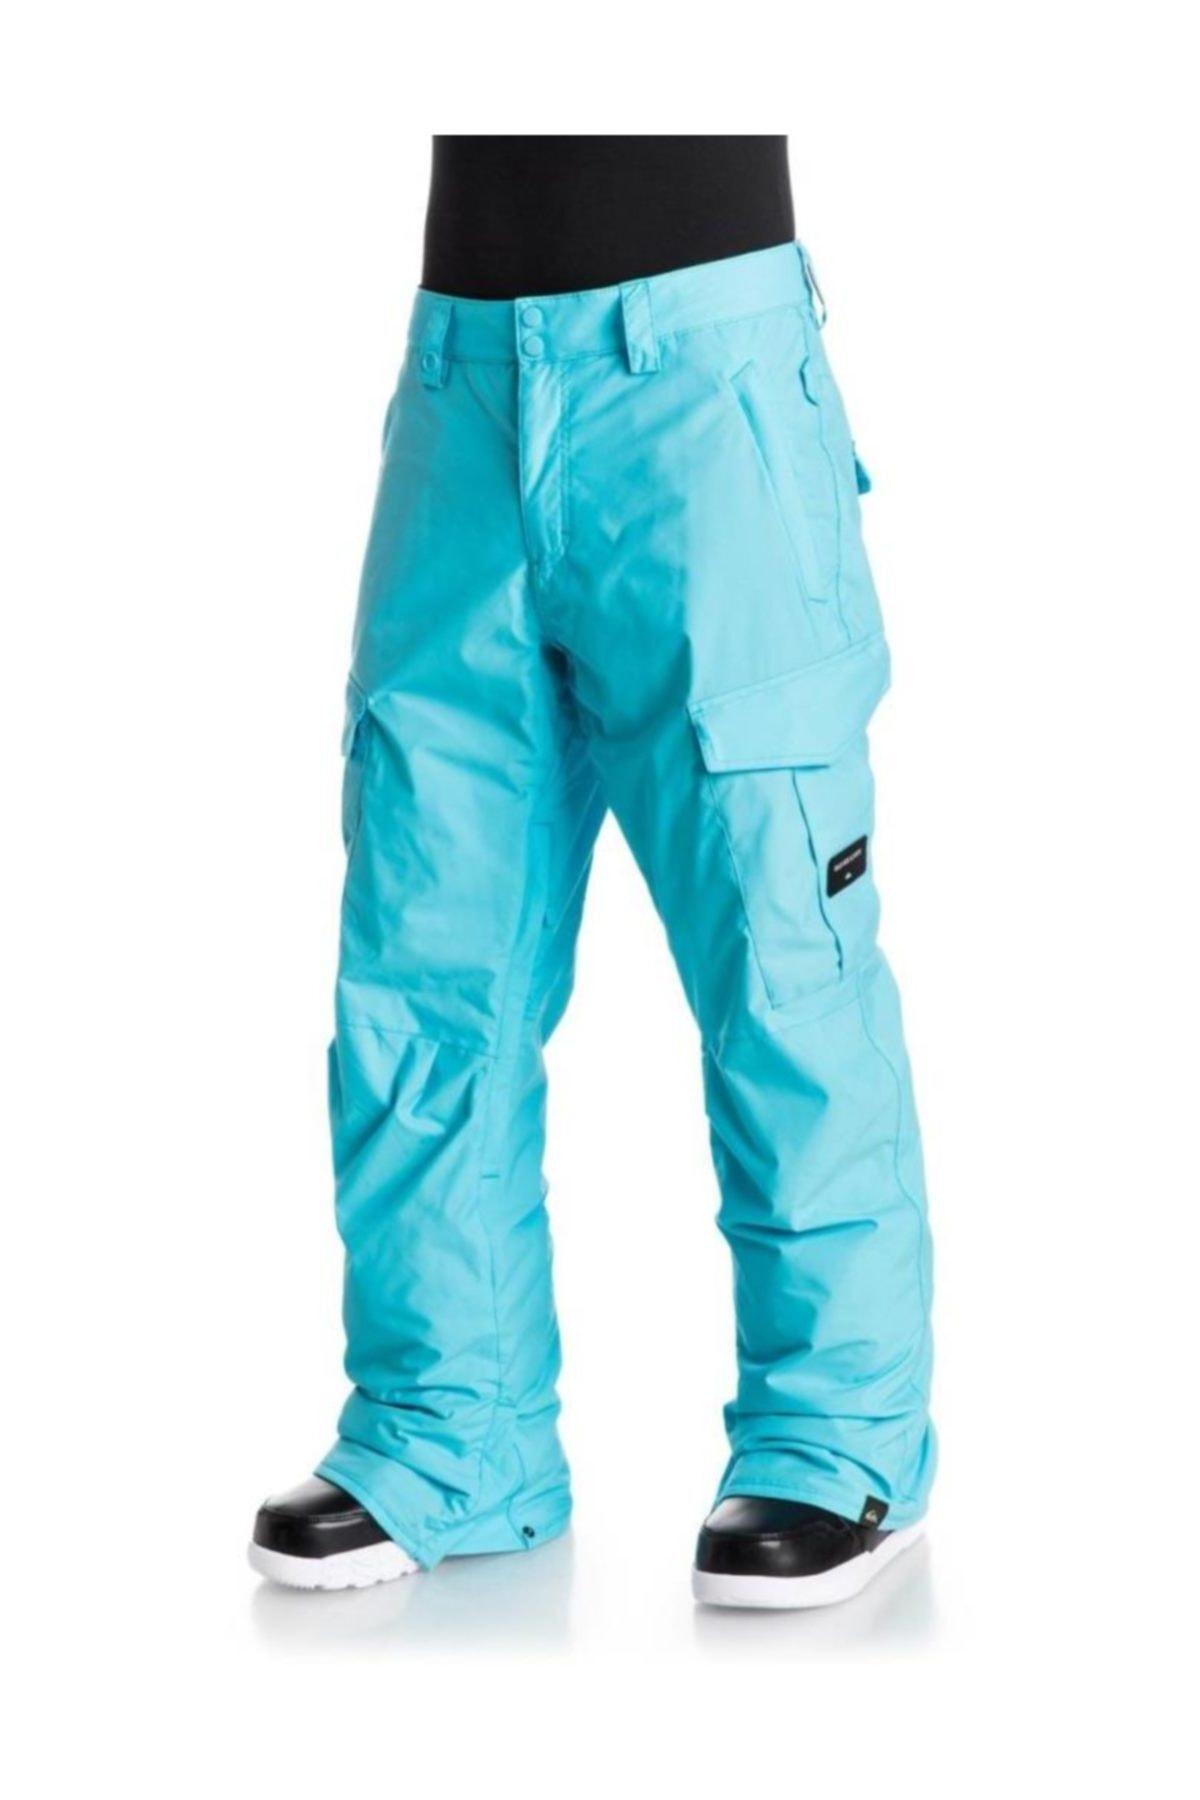 Quiksilver Porter Ins Erkek Kayak ve Snowboard Pantolonu Turkuaz 2